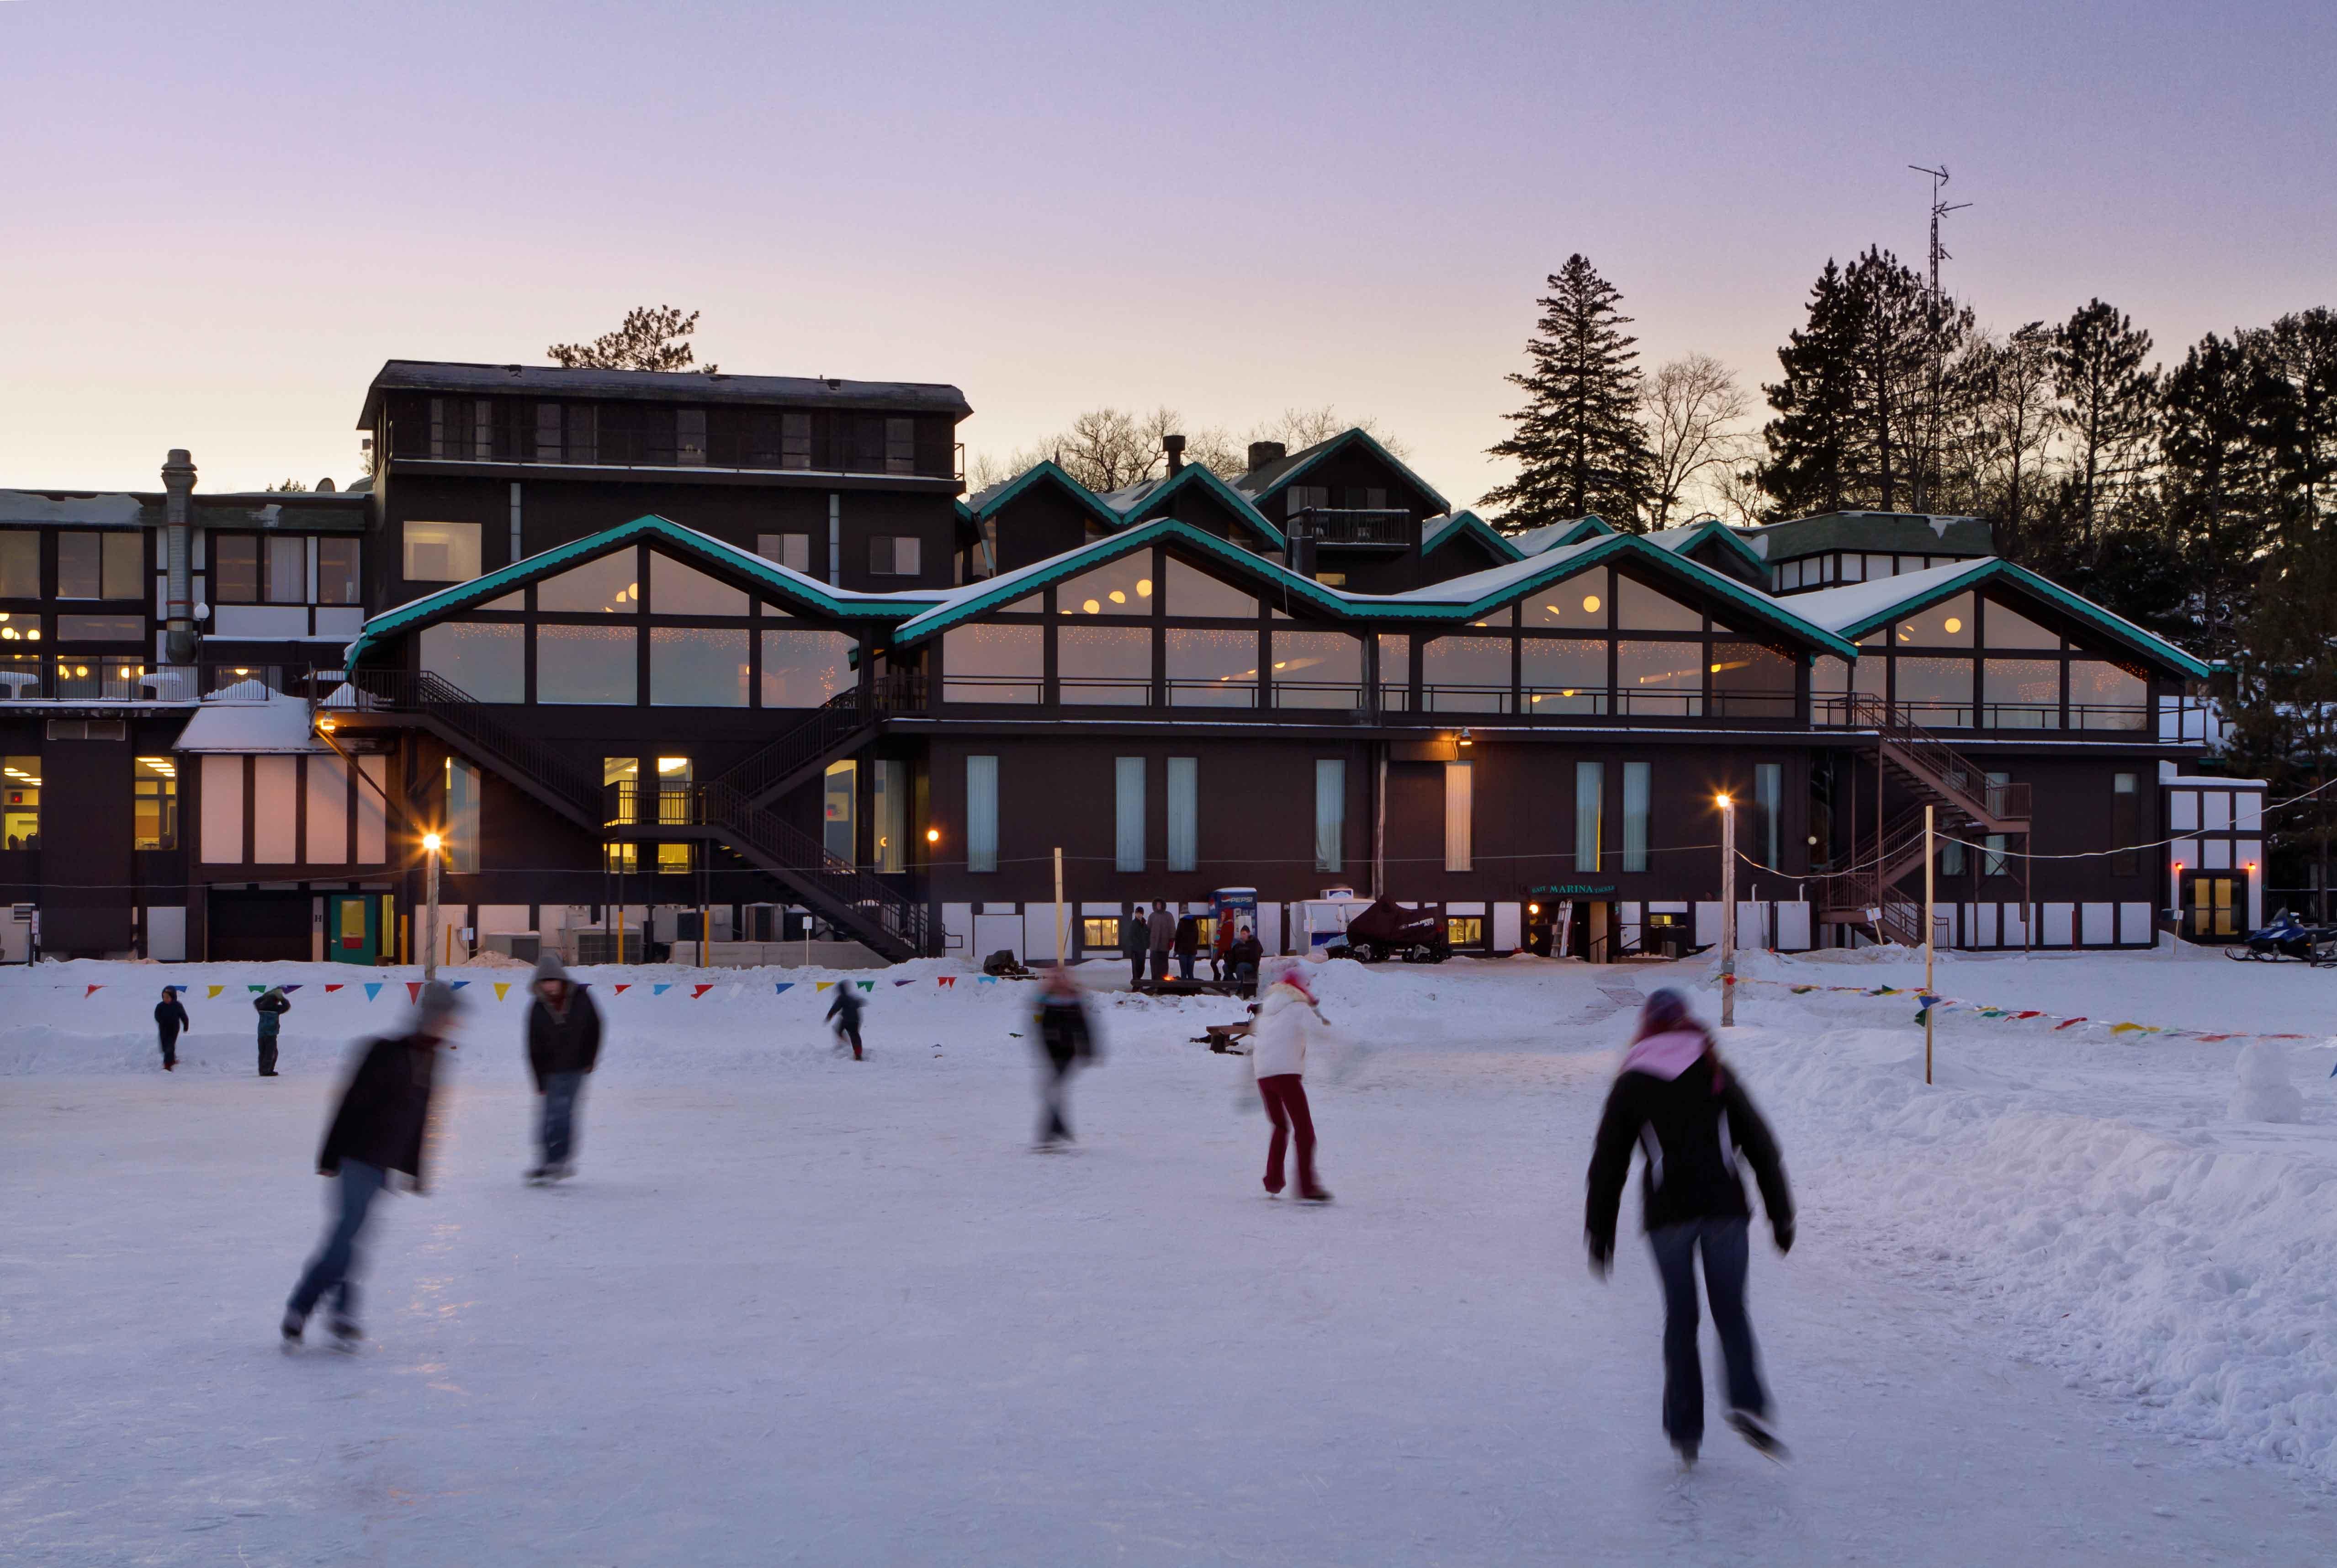 Ice skating in Brainerd